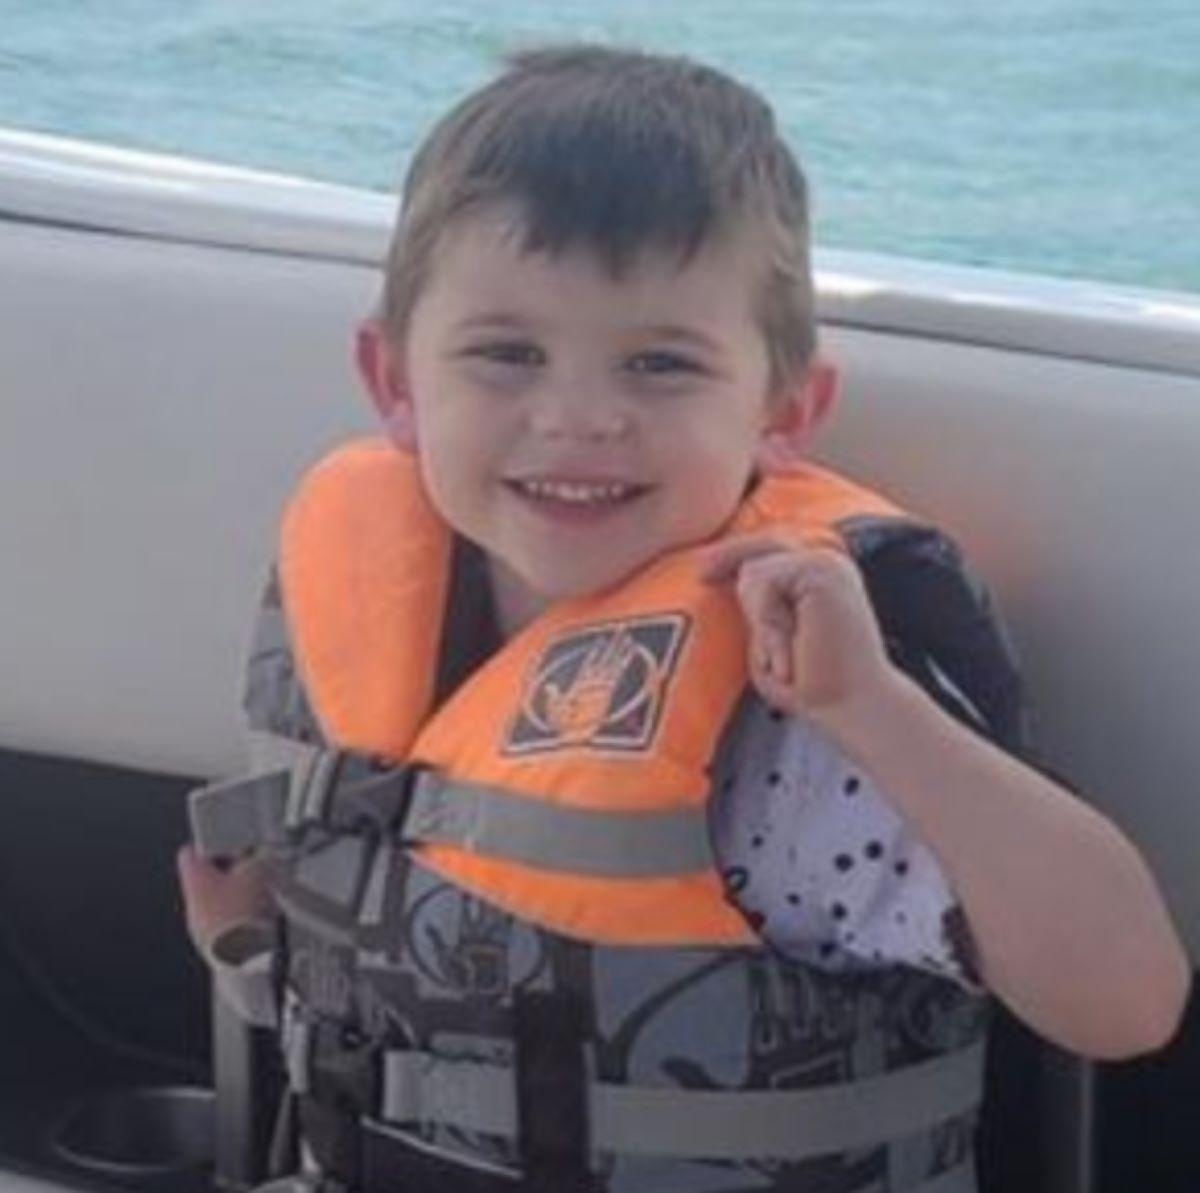 Kache Wallis 4 anni Morto Scatola Giocattoli Utah